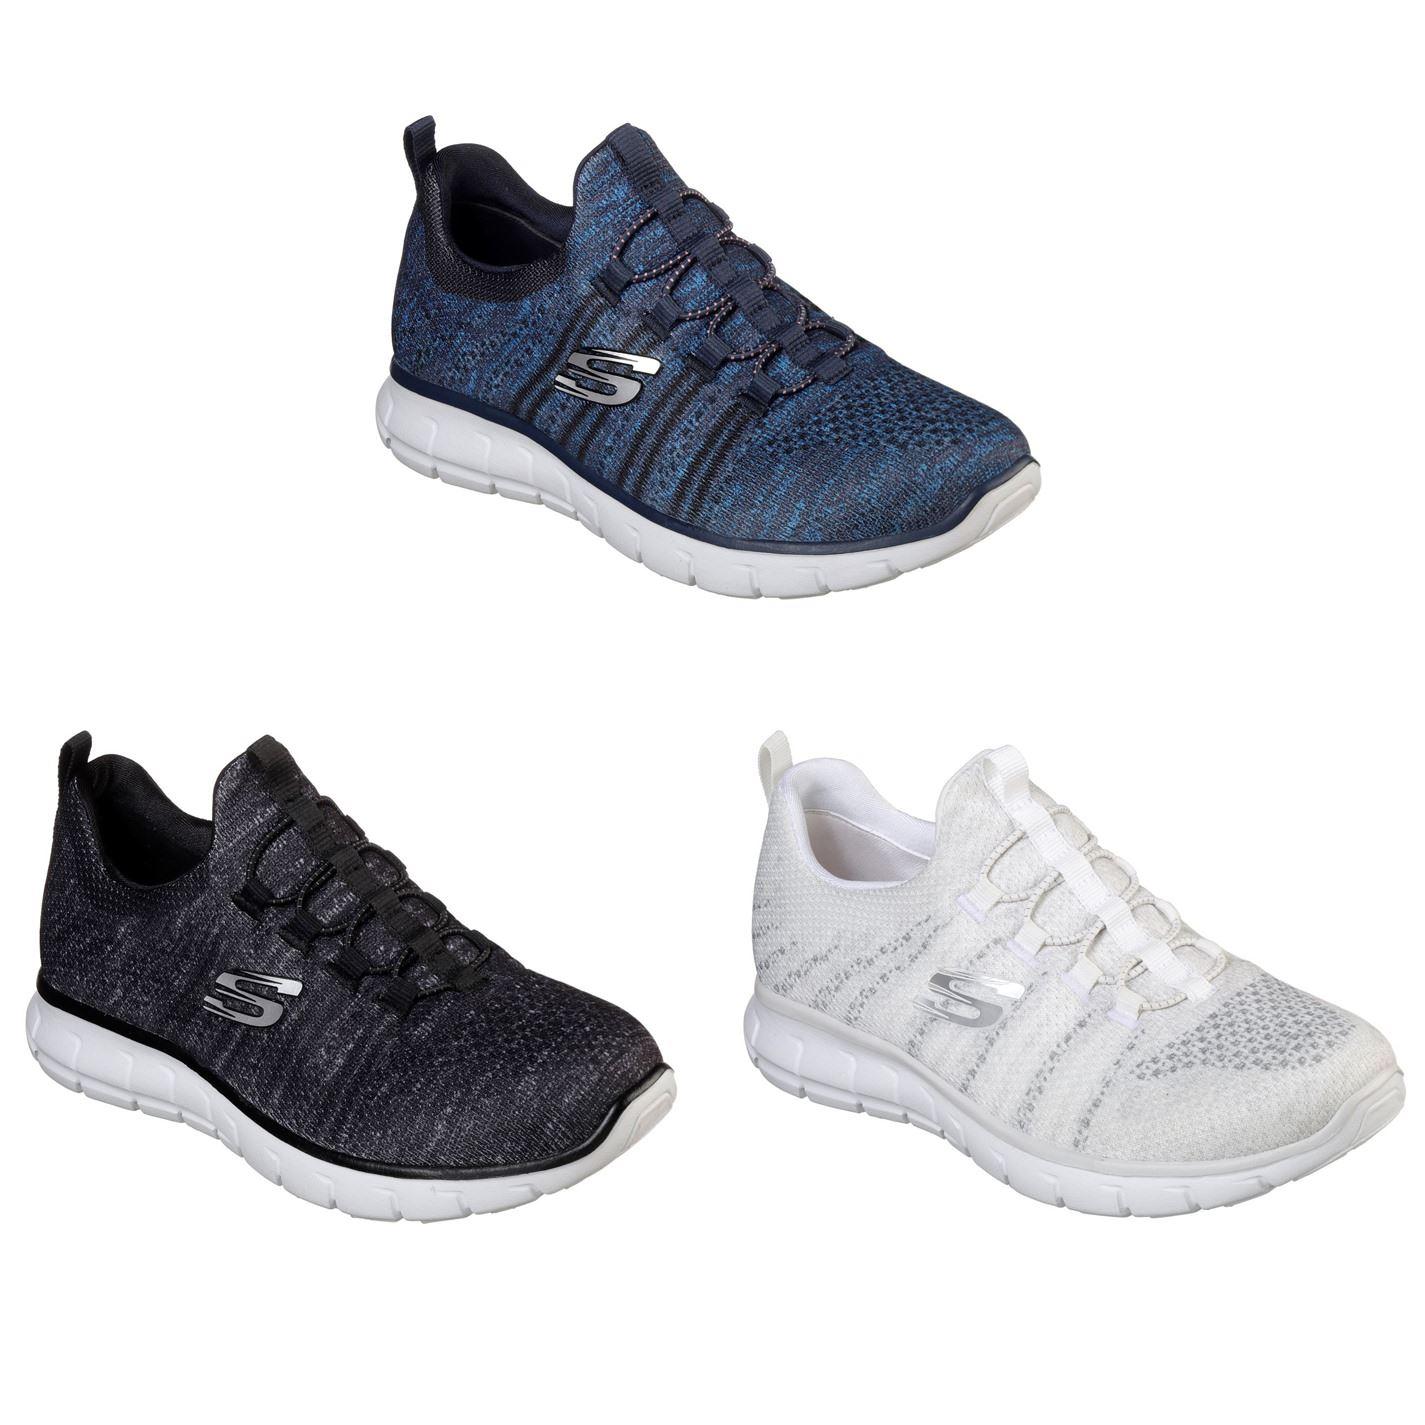 ... Skechers VIM Knit Shoes Ladies Womens Footwear ... 11e51a650e